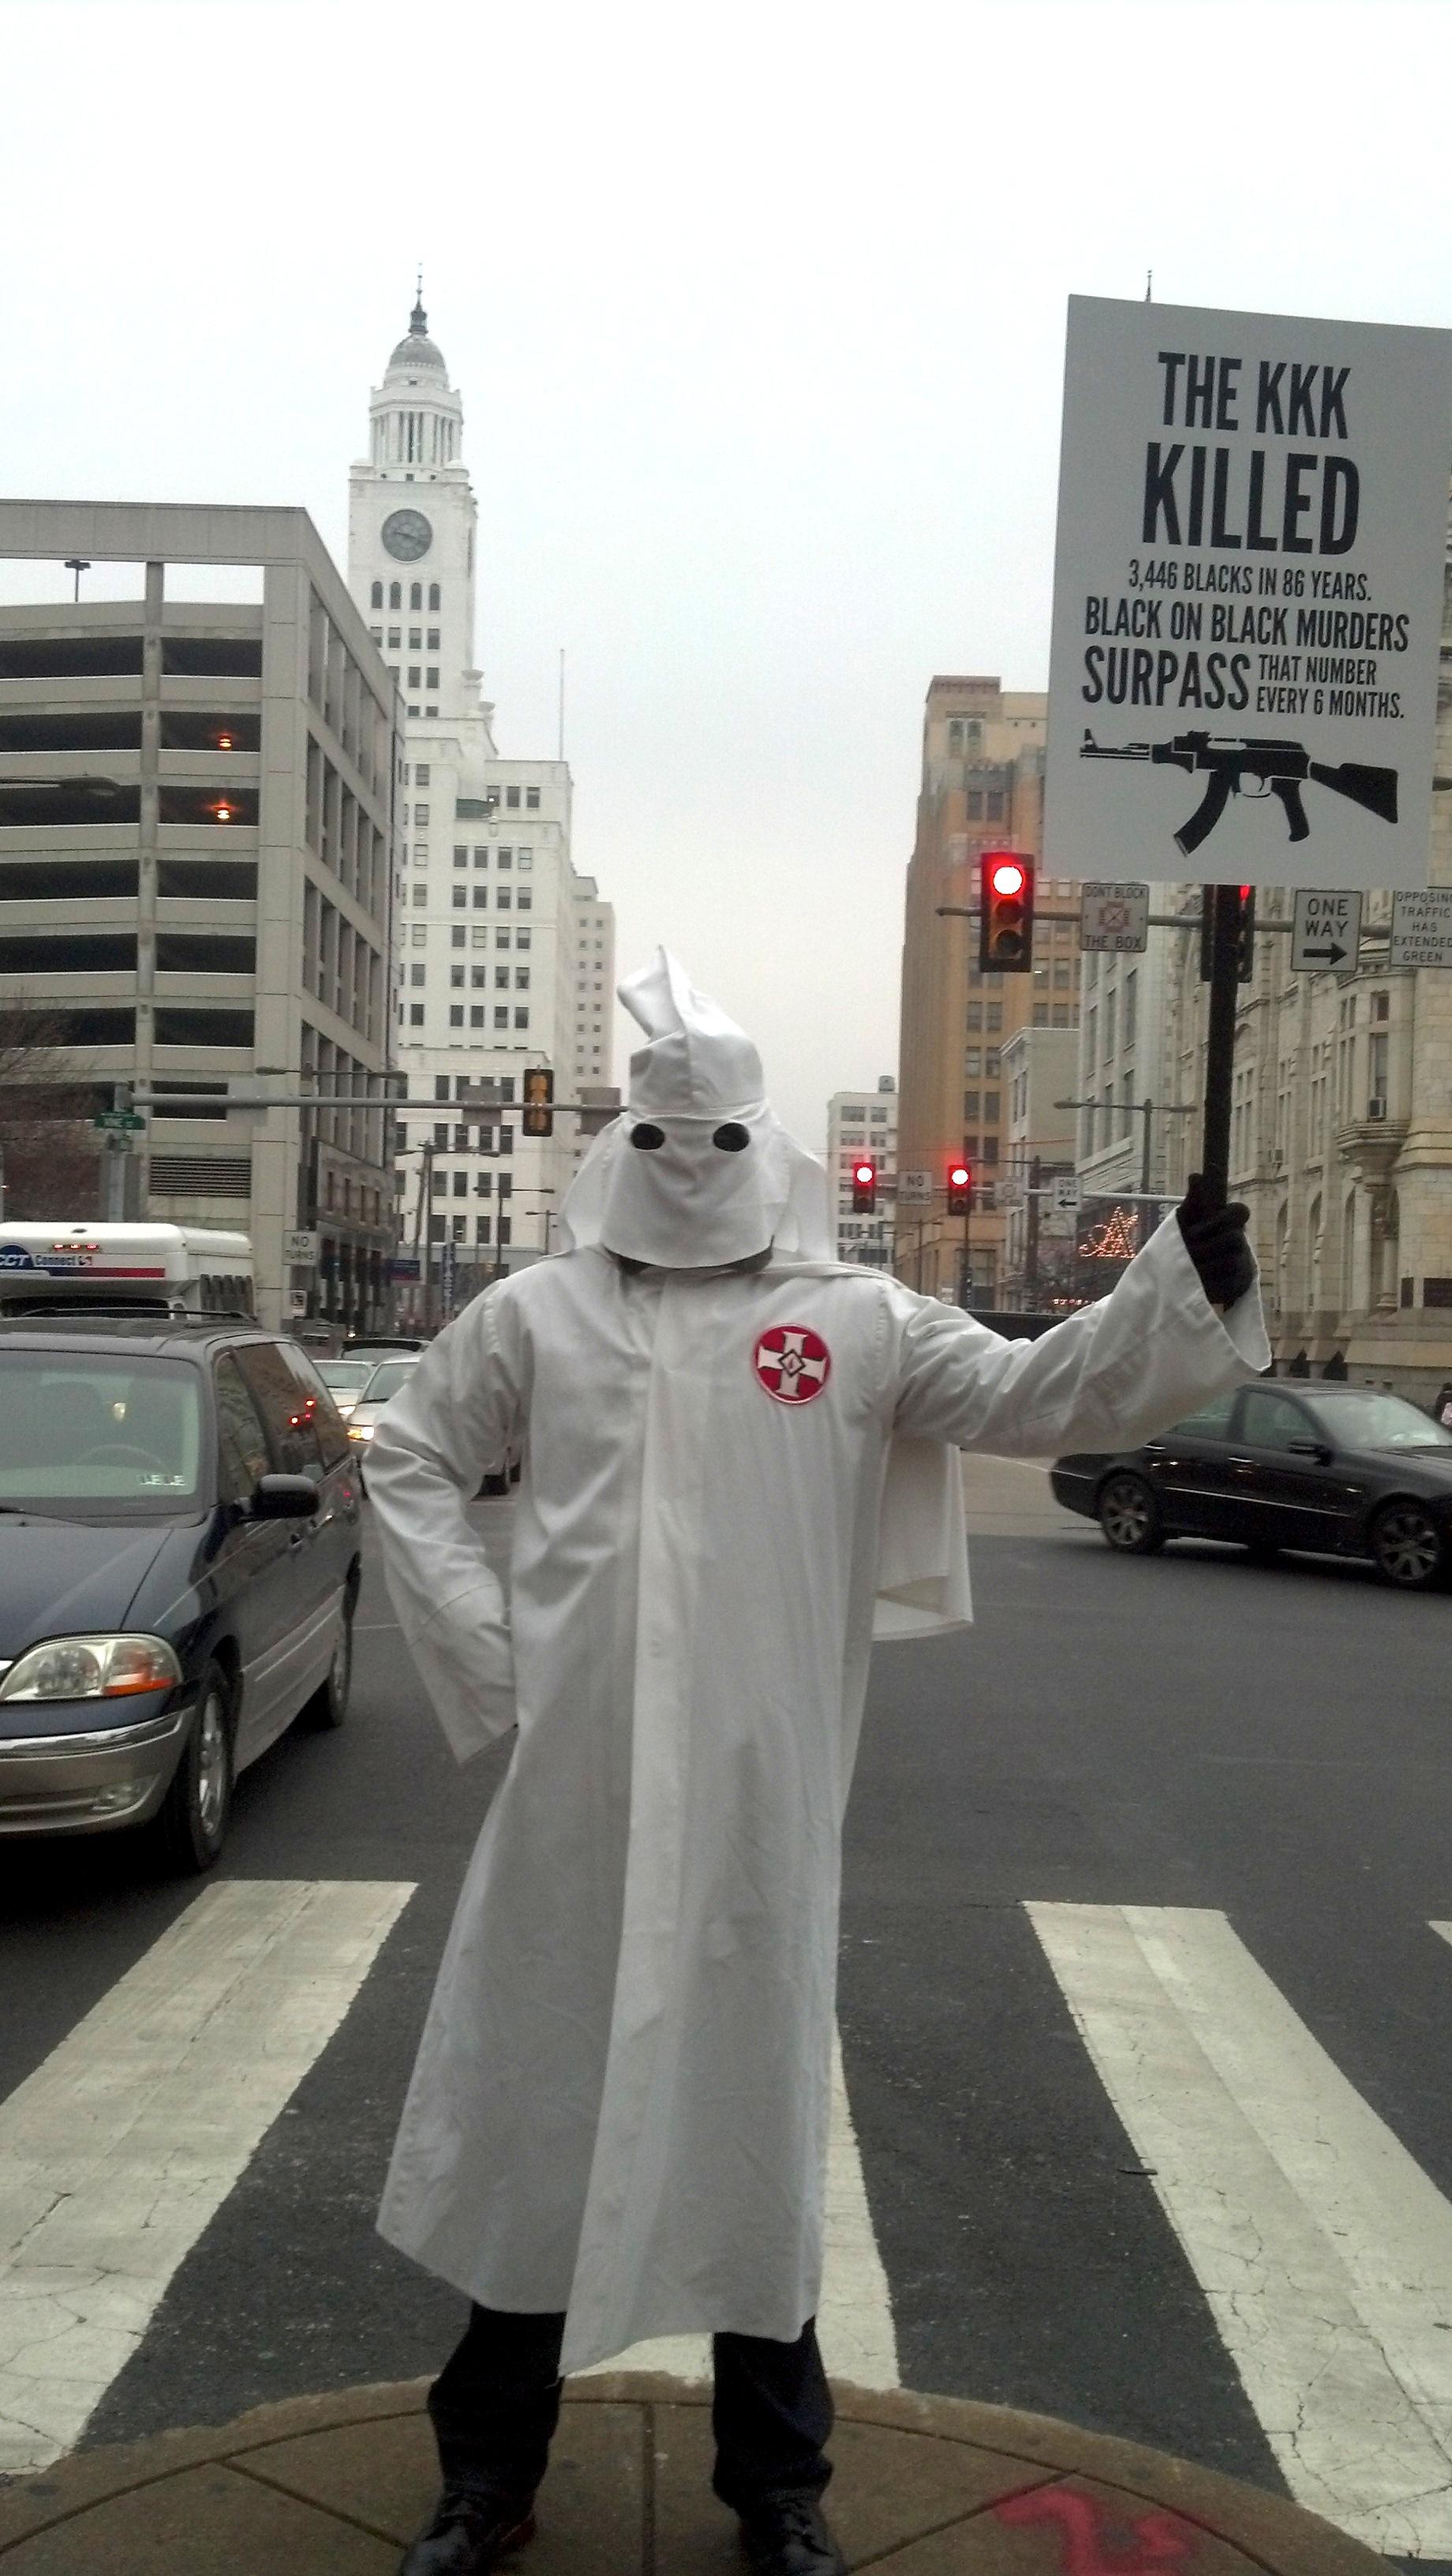 Sixx King Klan